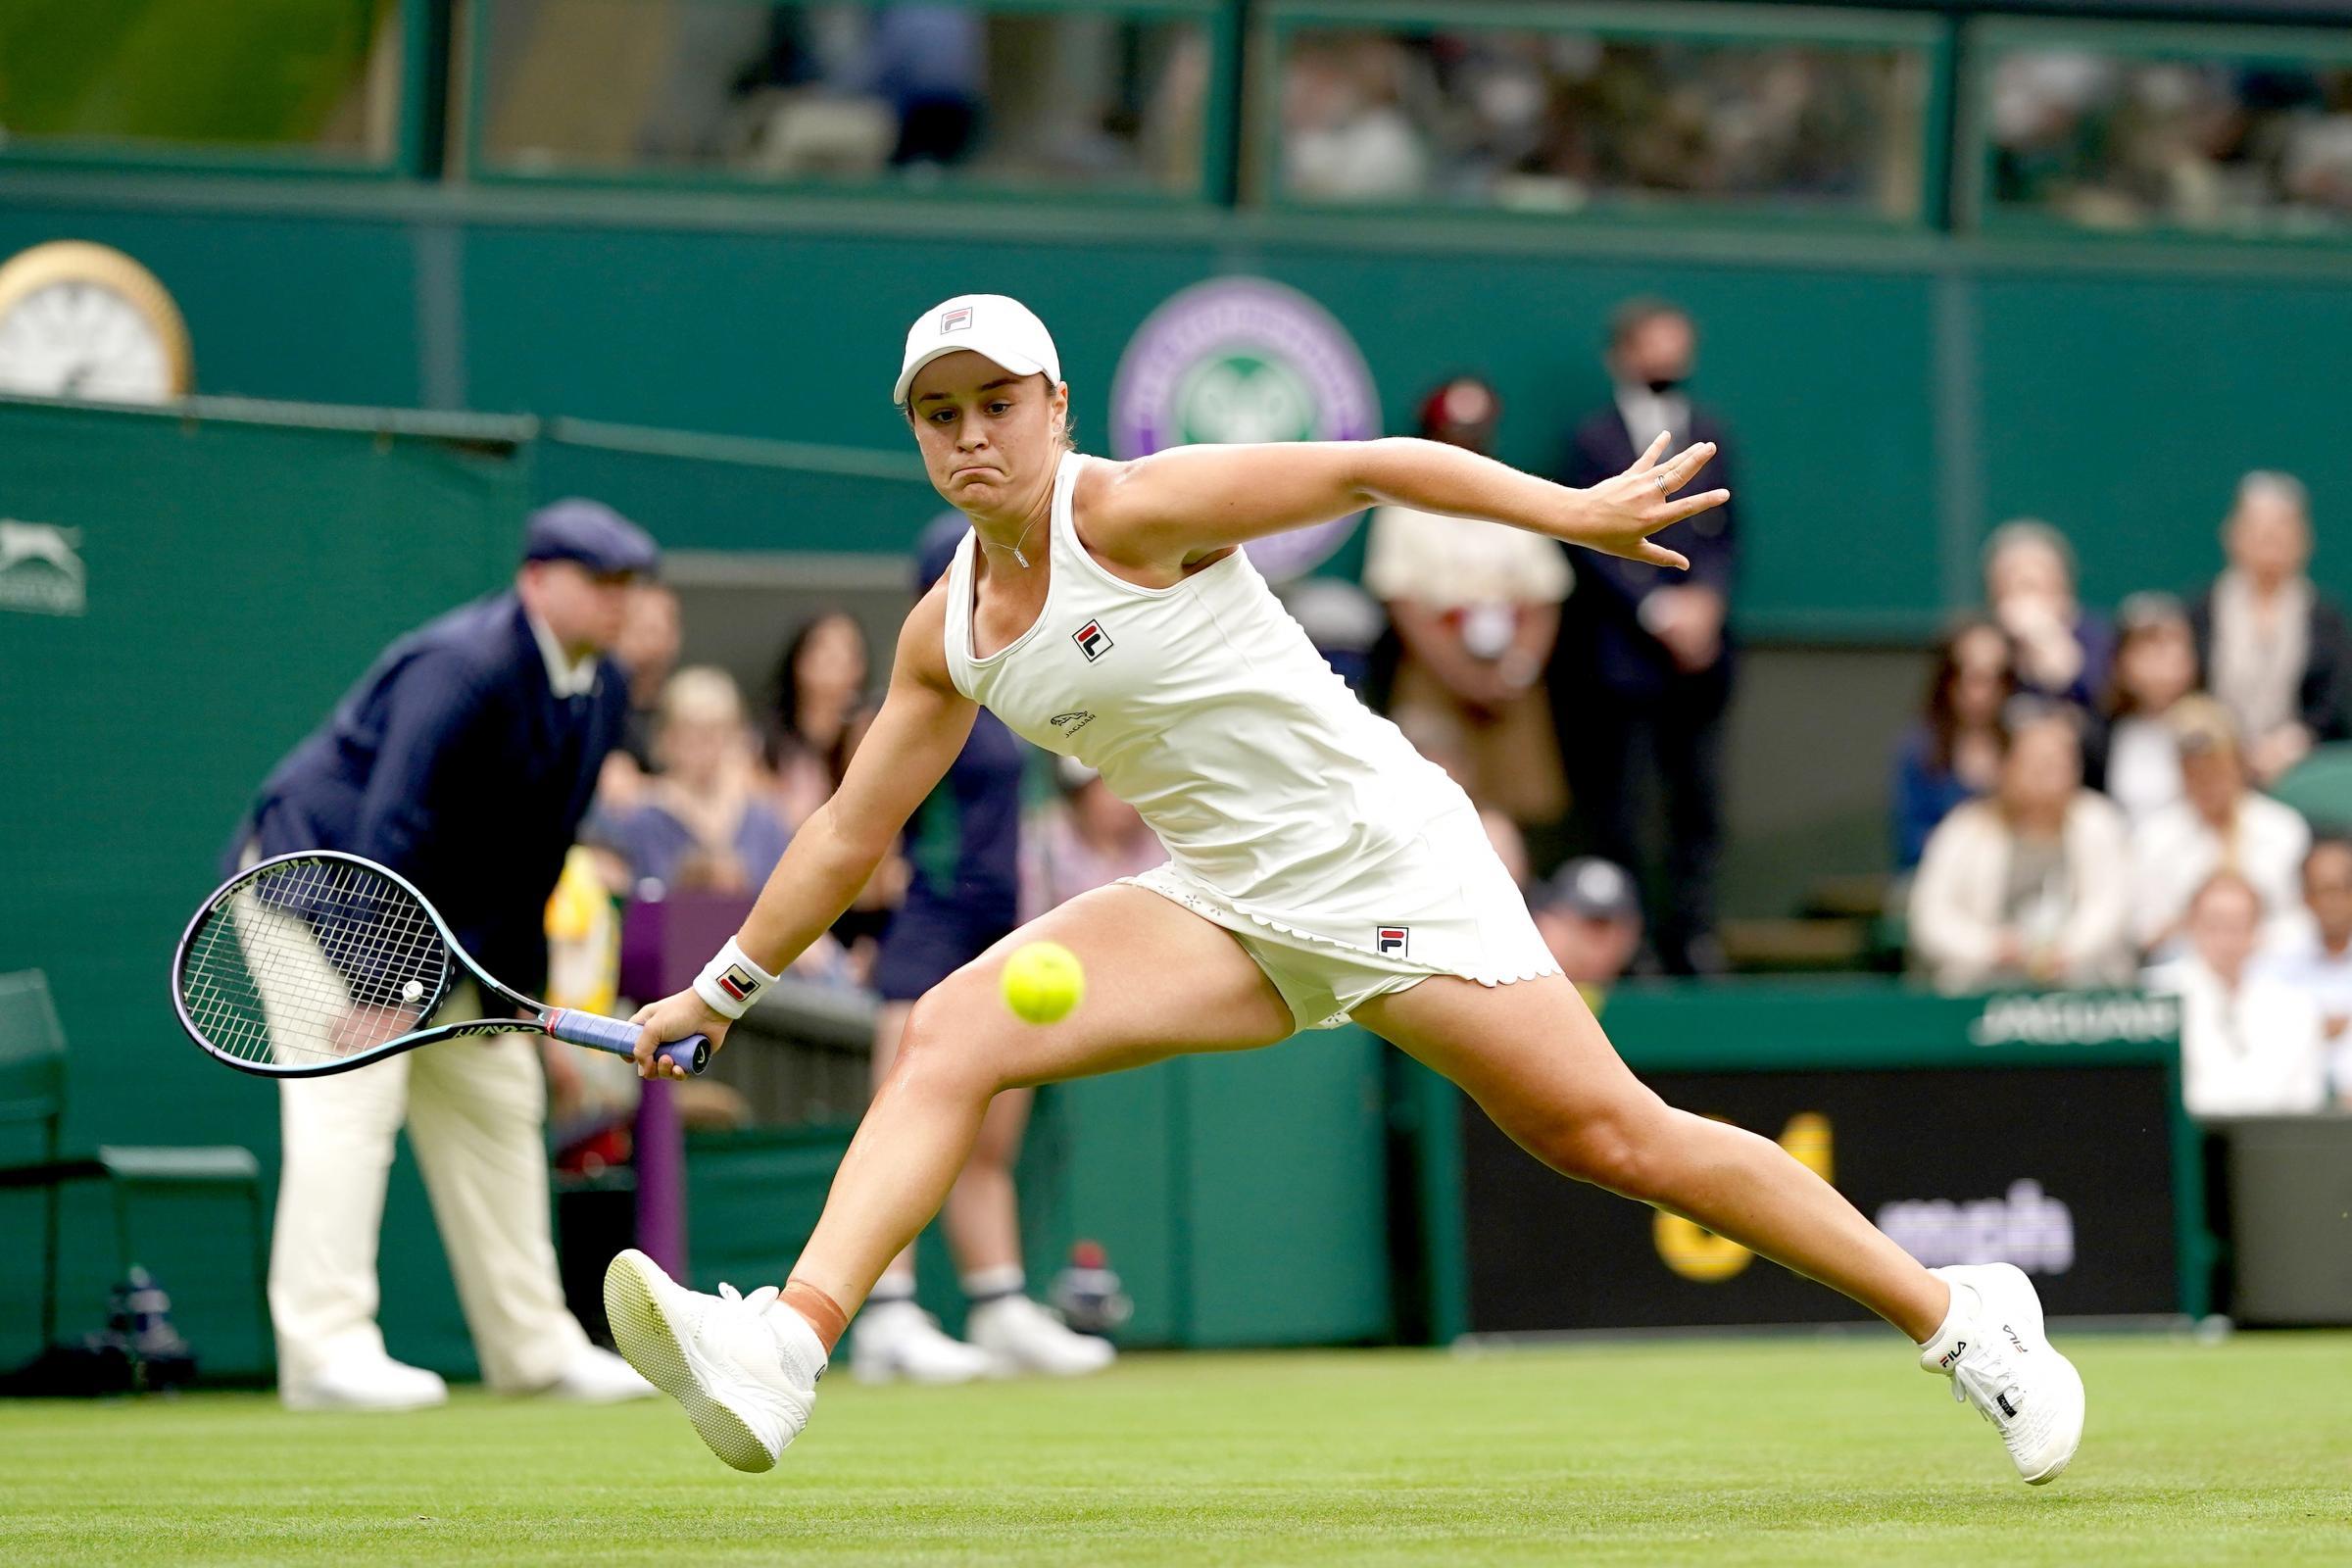 Wimbledon Championships 2021: Ashleigh Barty vs. Anna Blinkova Tennis Pick and Prediction